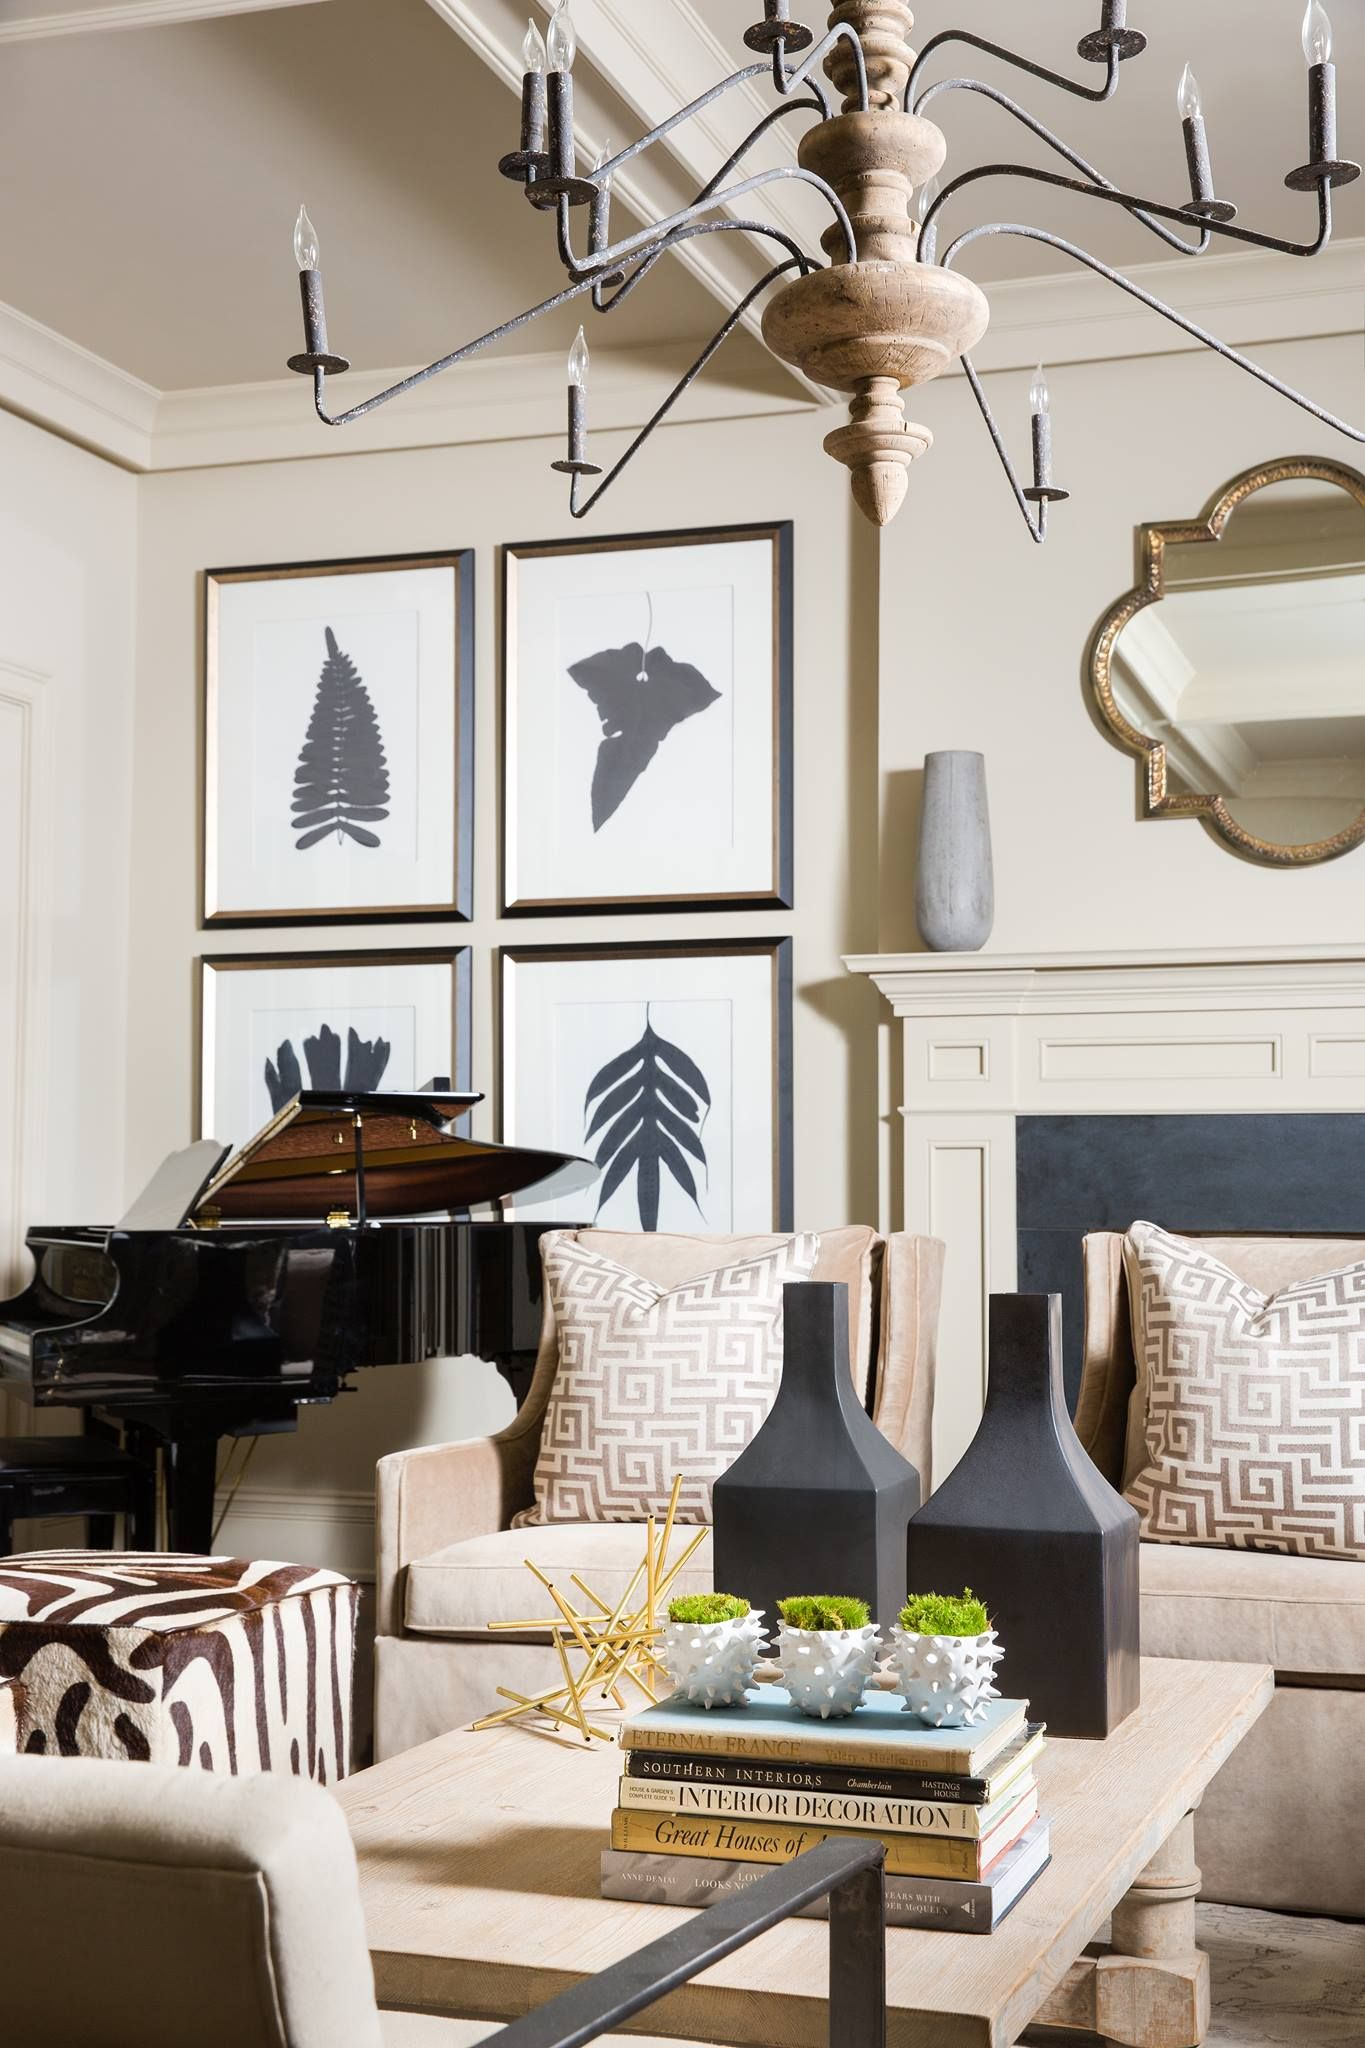 Stanton home furnishings love this light fixture